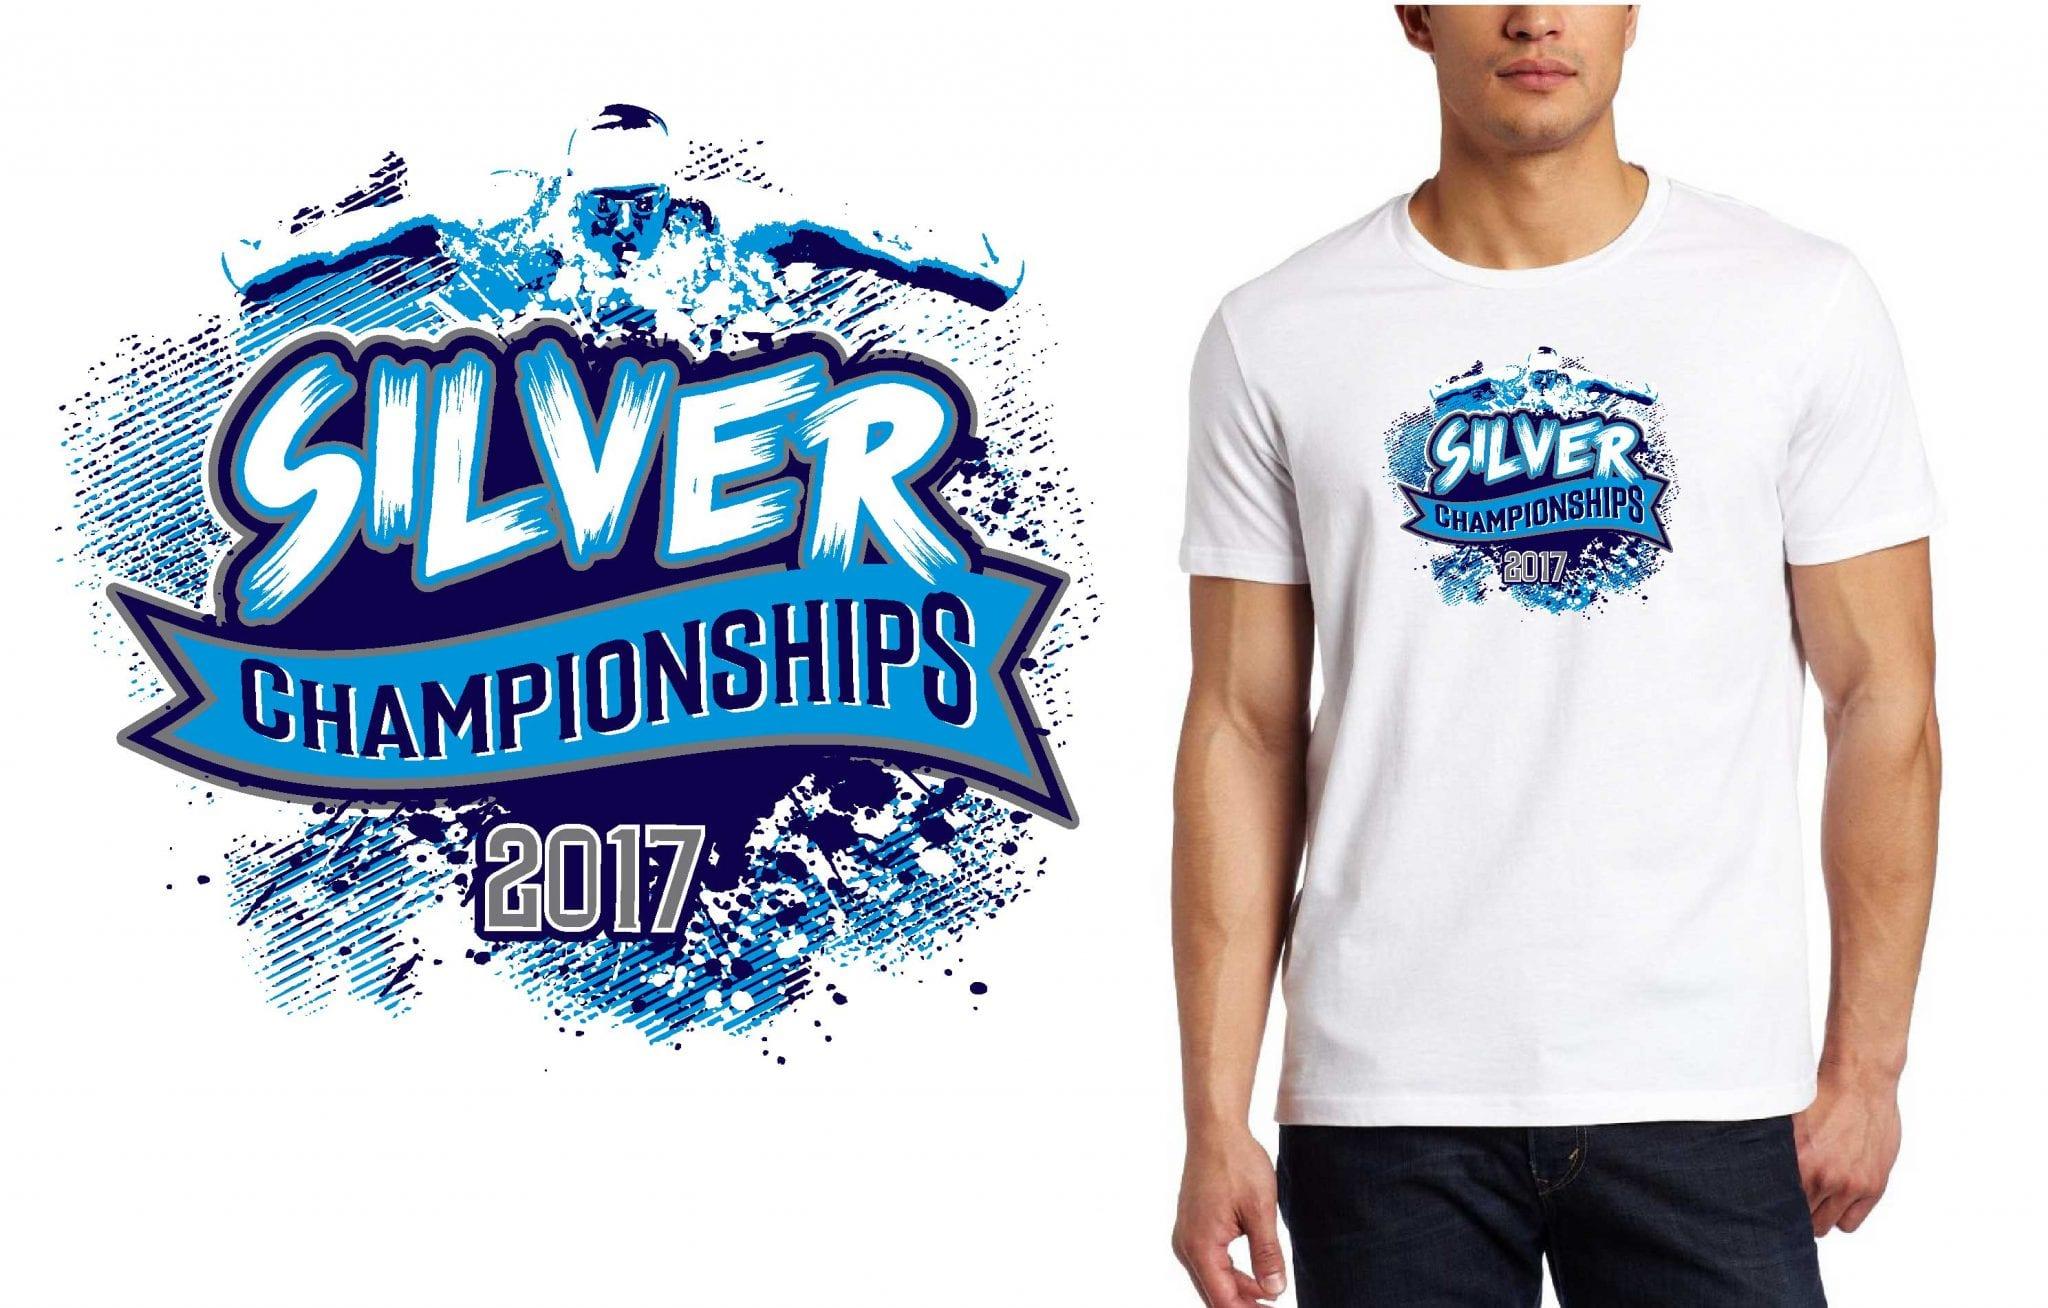 2017 Silver Championships vector logo design for swimming t-shirt UrArtStudio